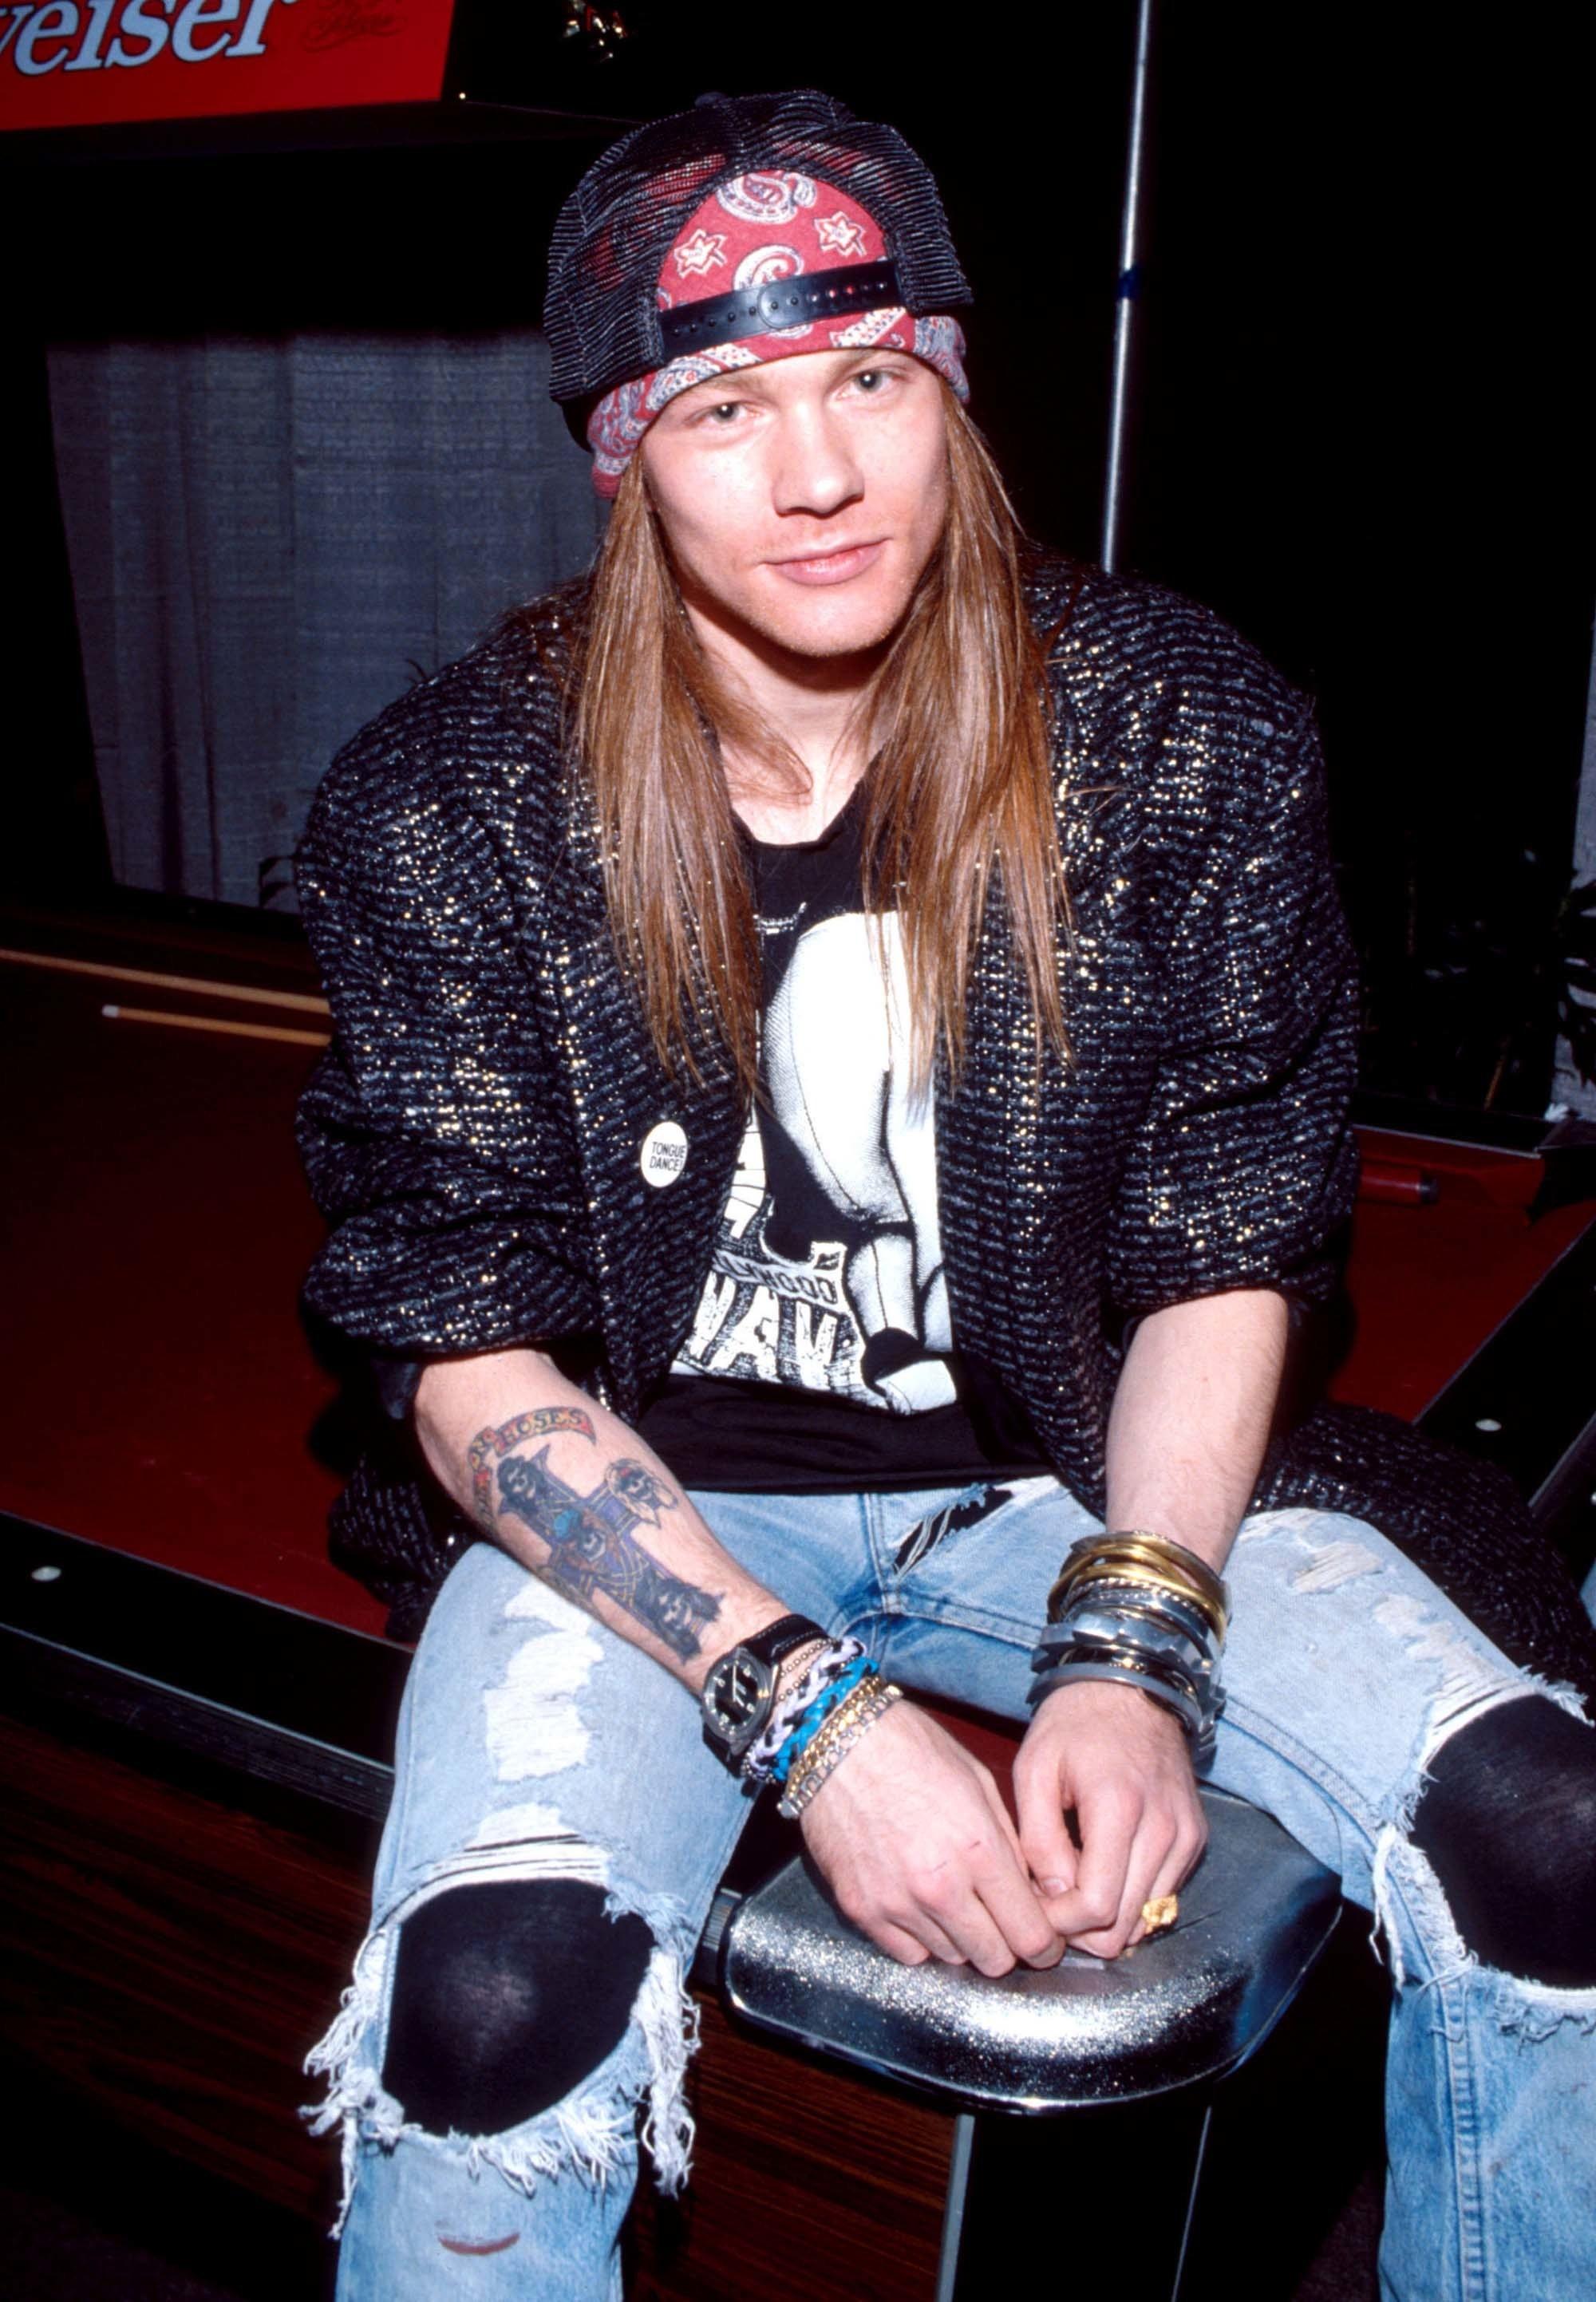 Coachella 2016 Axl Roses Best Guns N Roses Hair Moments 2000x2885